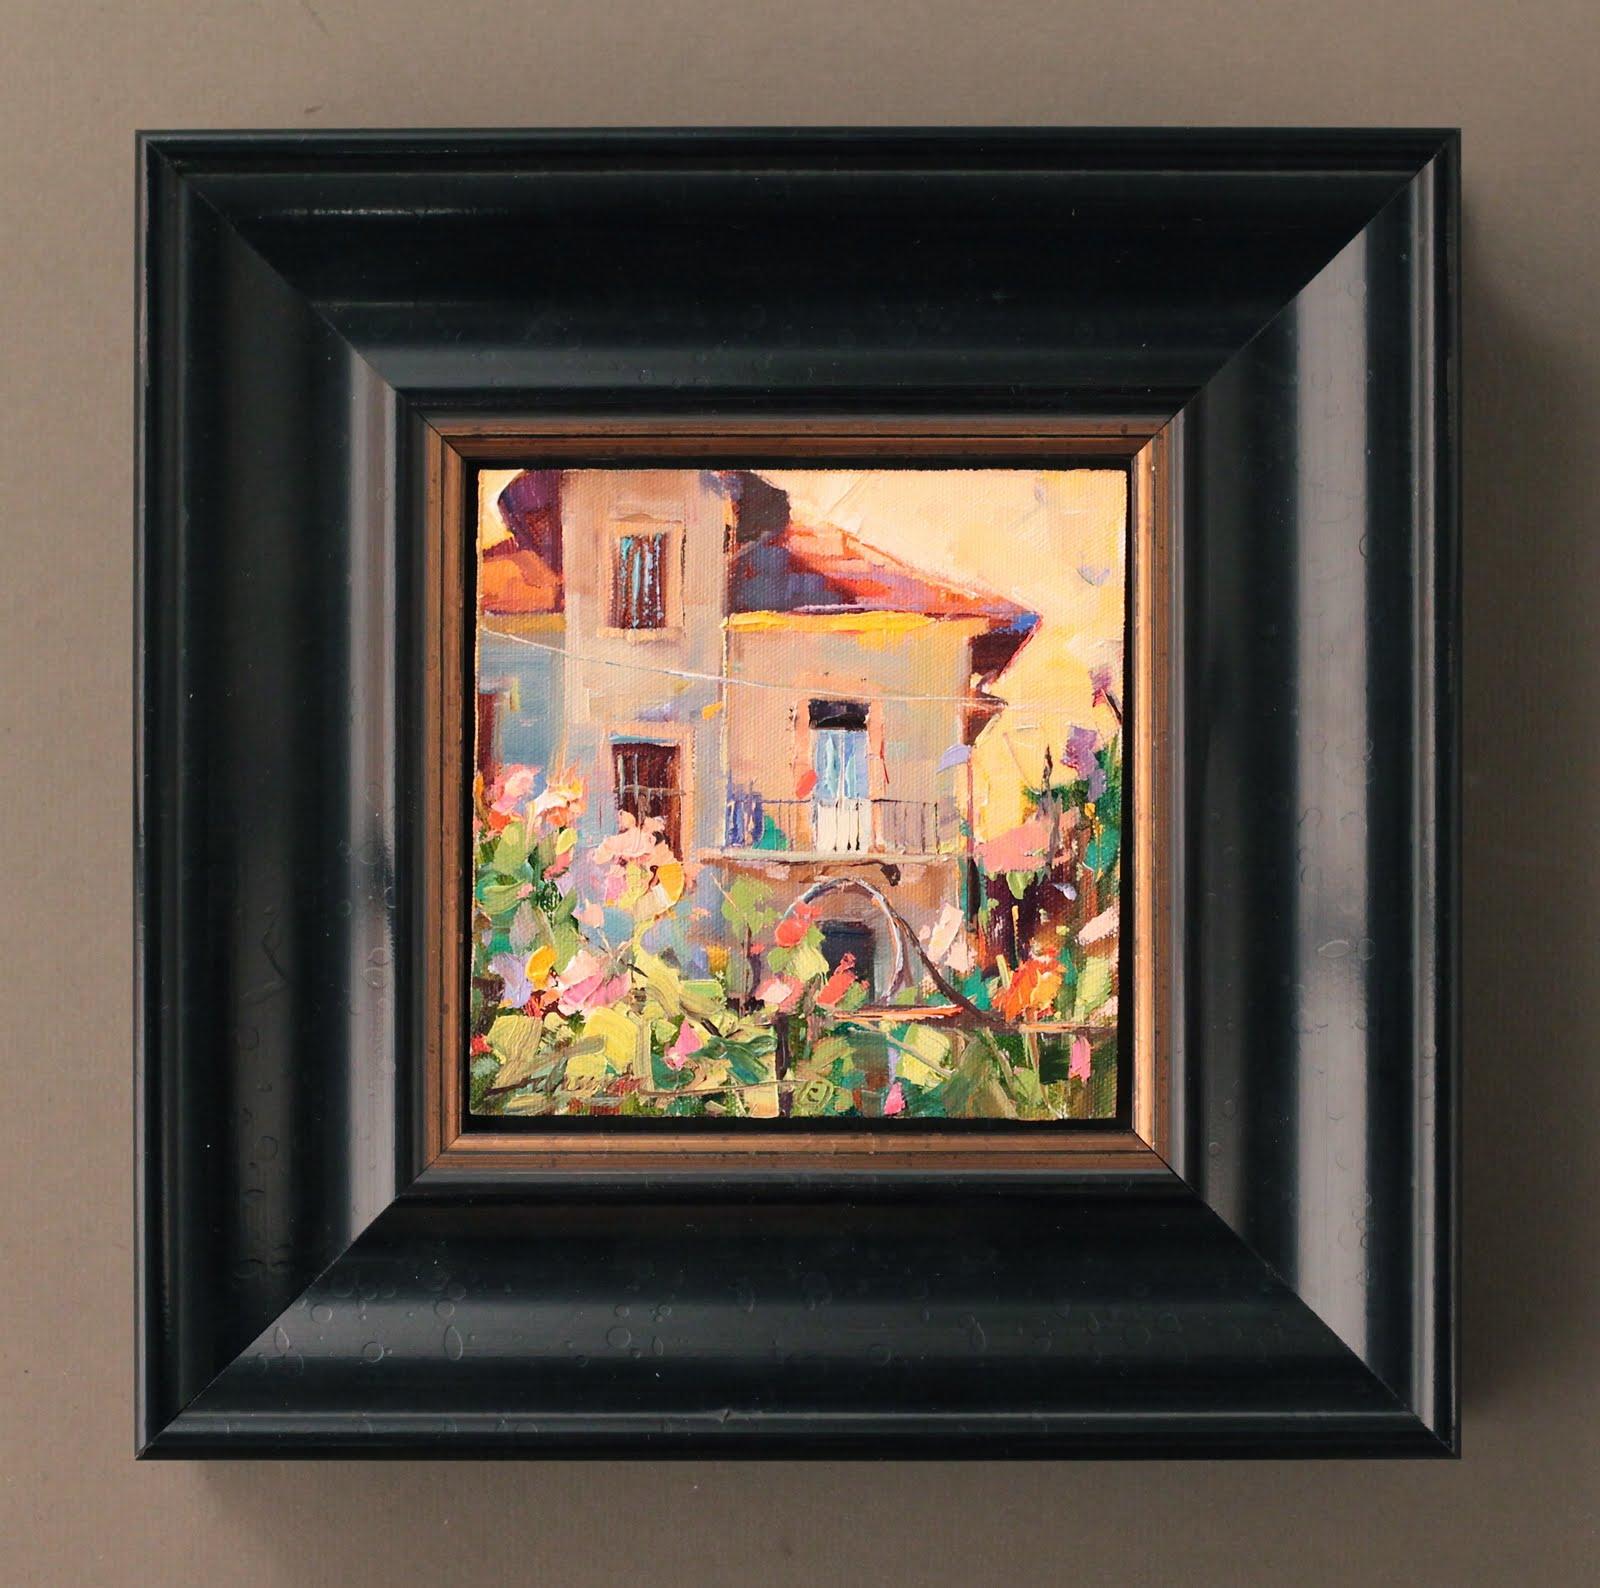 Randy Higbee Gallery Floater Frames Now On Kingofframe Com